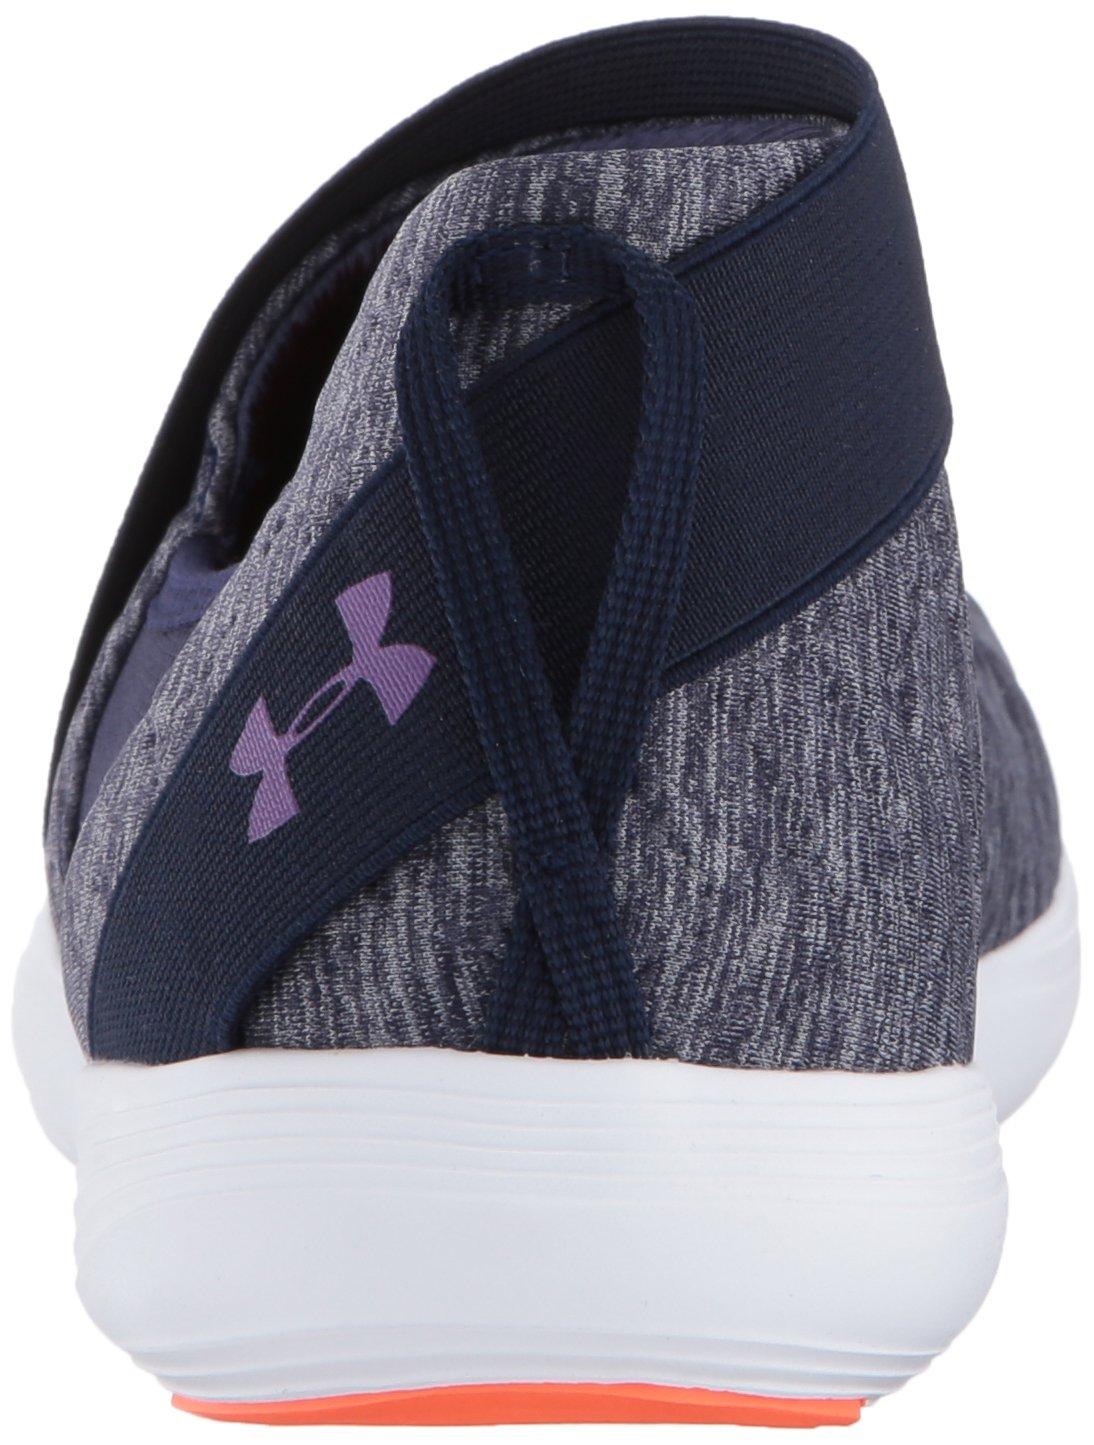 Under Armour Women's Street Precision Slip Metallic Cross-Trainer Shoe B01N0QZONN 12 M US|Midnight Navy (410)/White